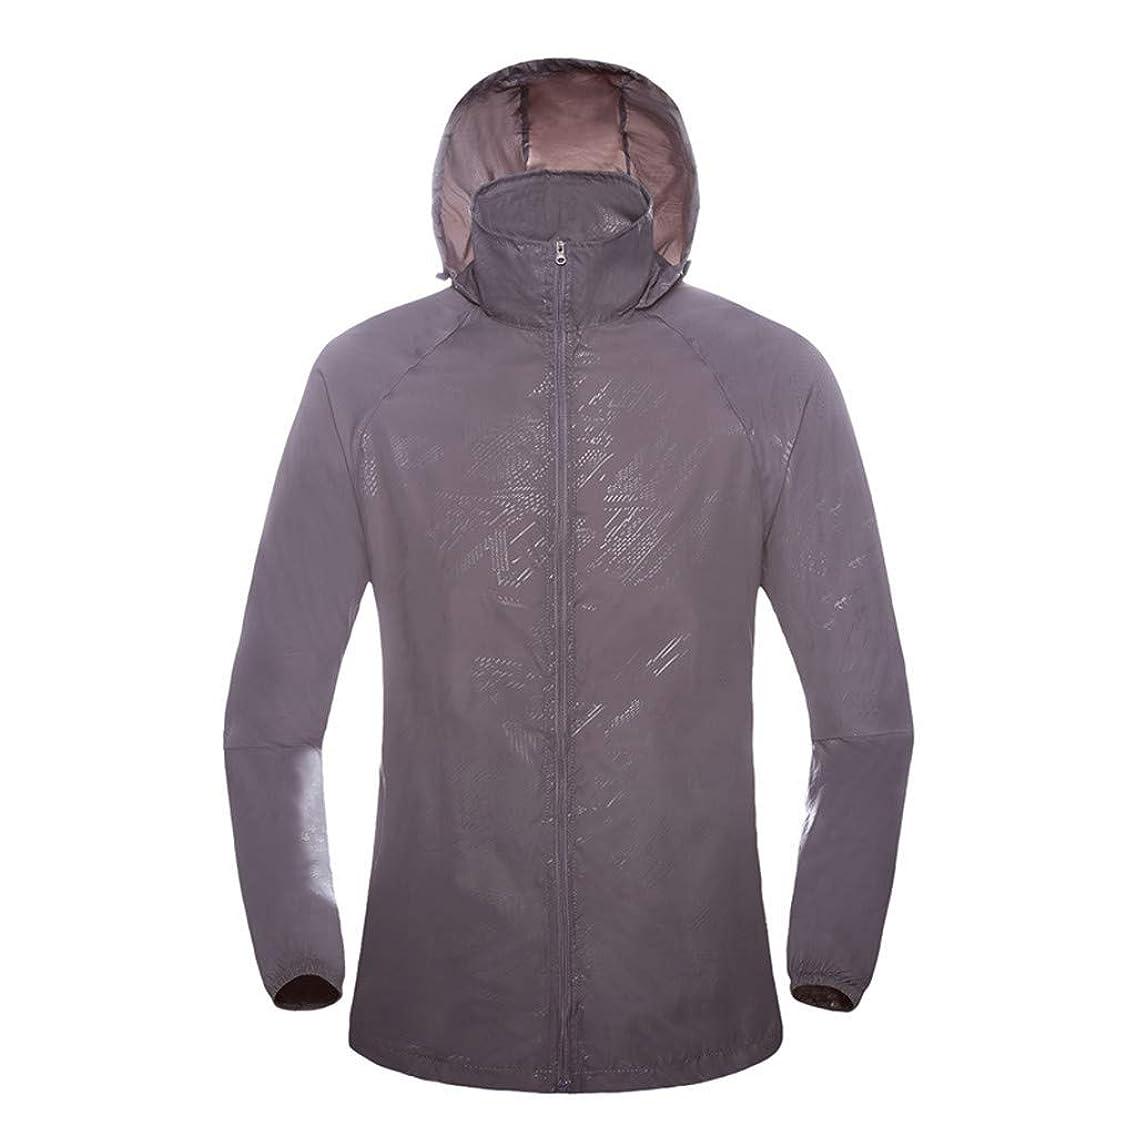 Women Men Jacket Outdoor Hooded Windproof Jackets Sports Ultra-Light Tops Quick Dry Windbreaker YQZB UV Protection Coat